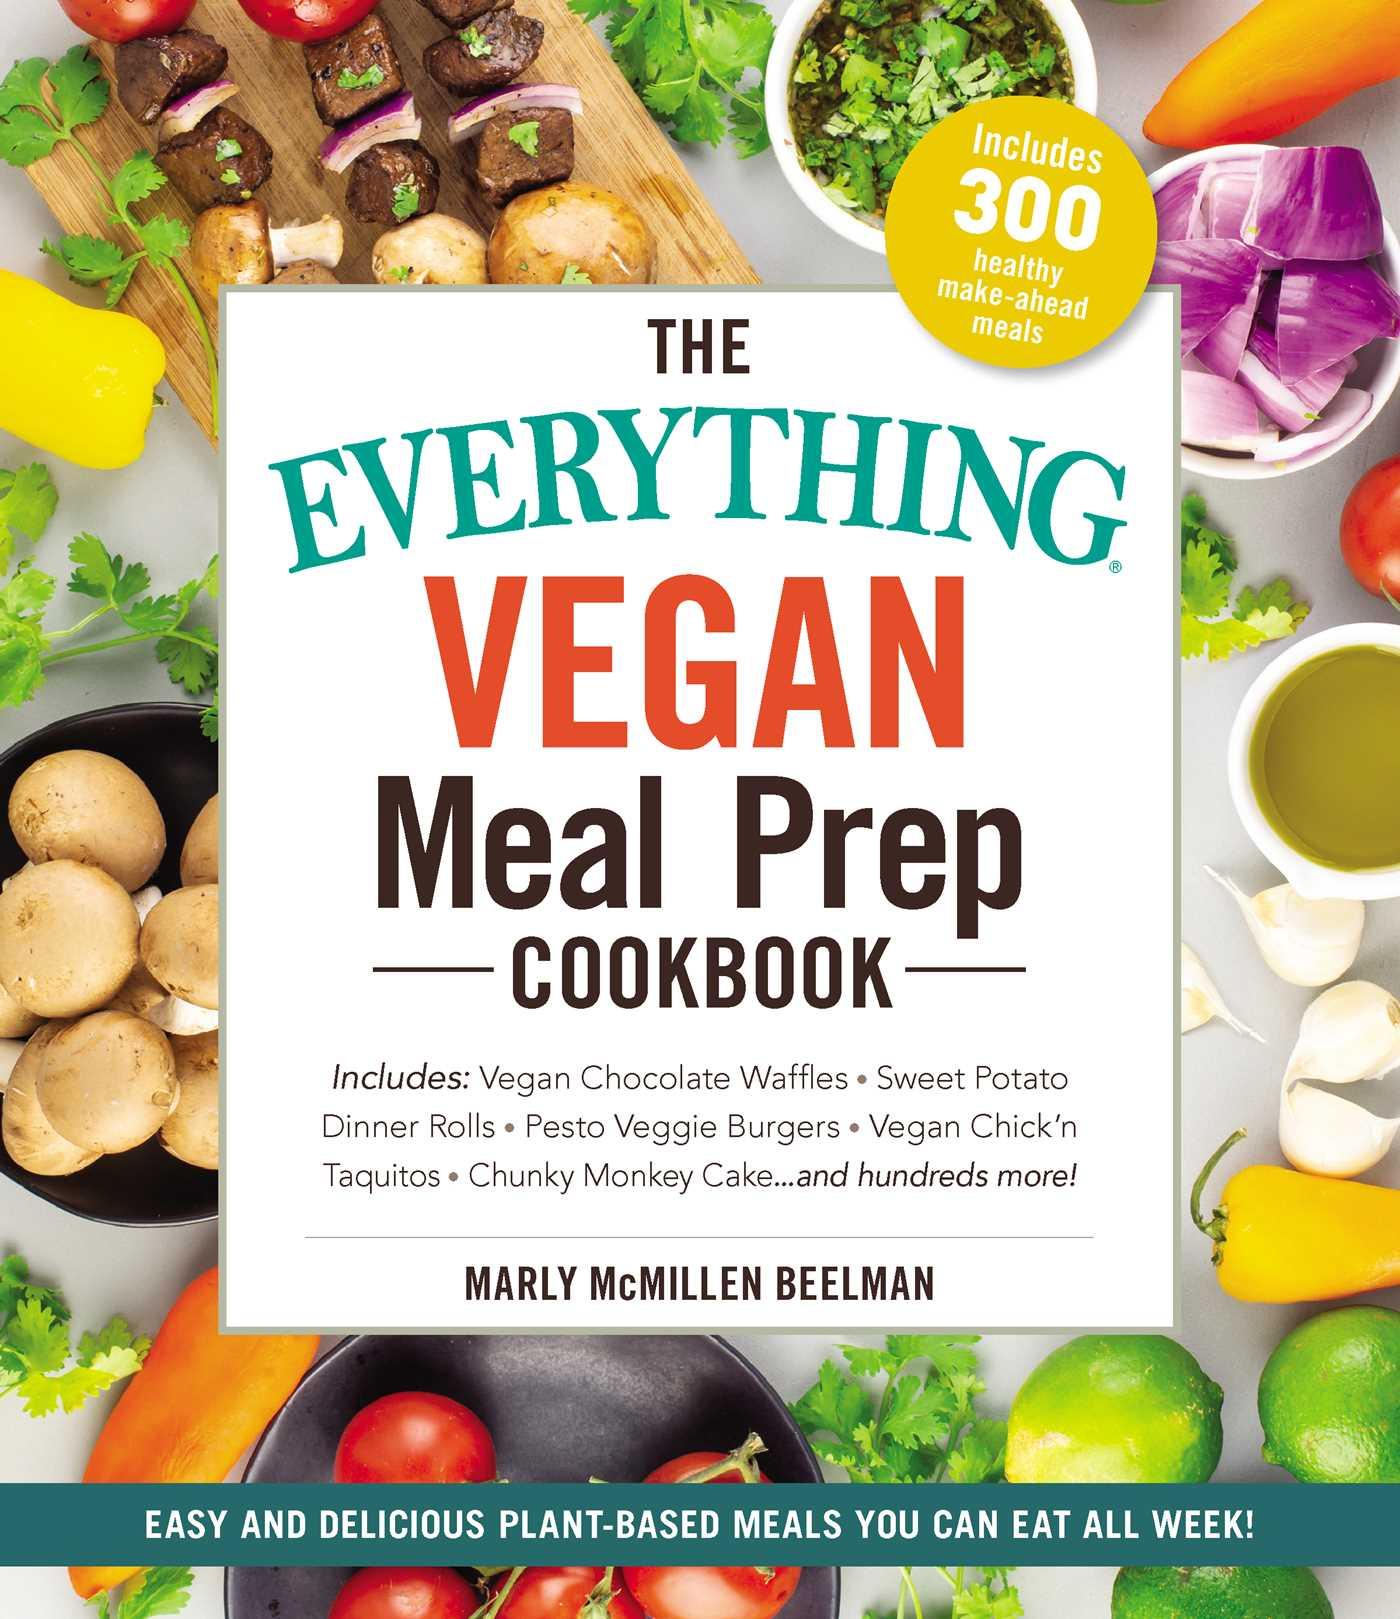 The everything vegan meal prep cookbook 9781507210178 hr